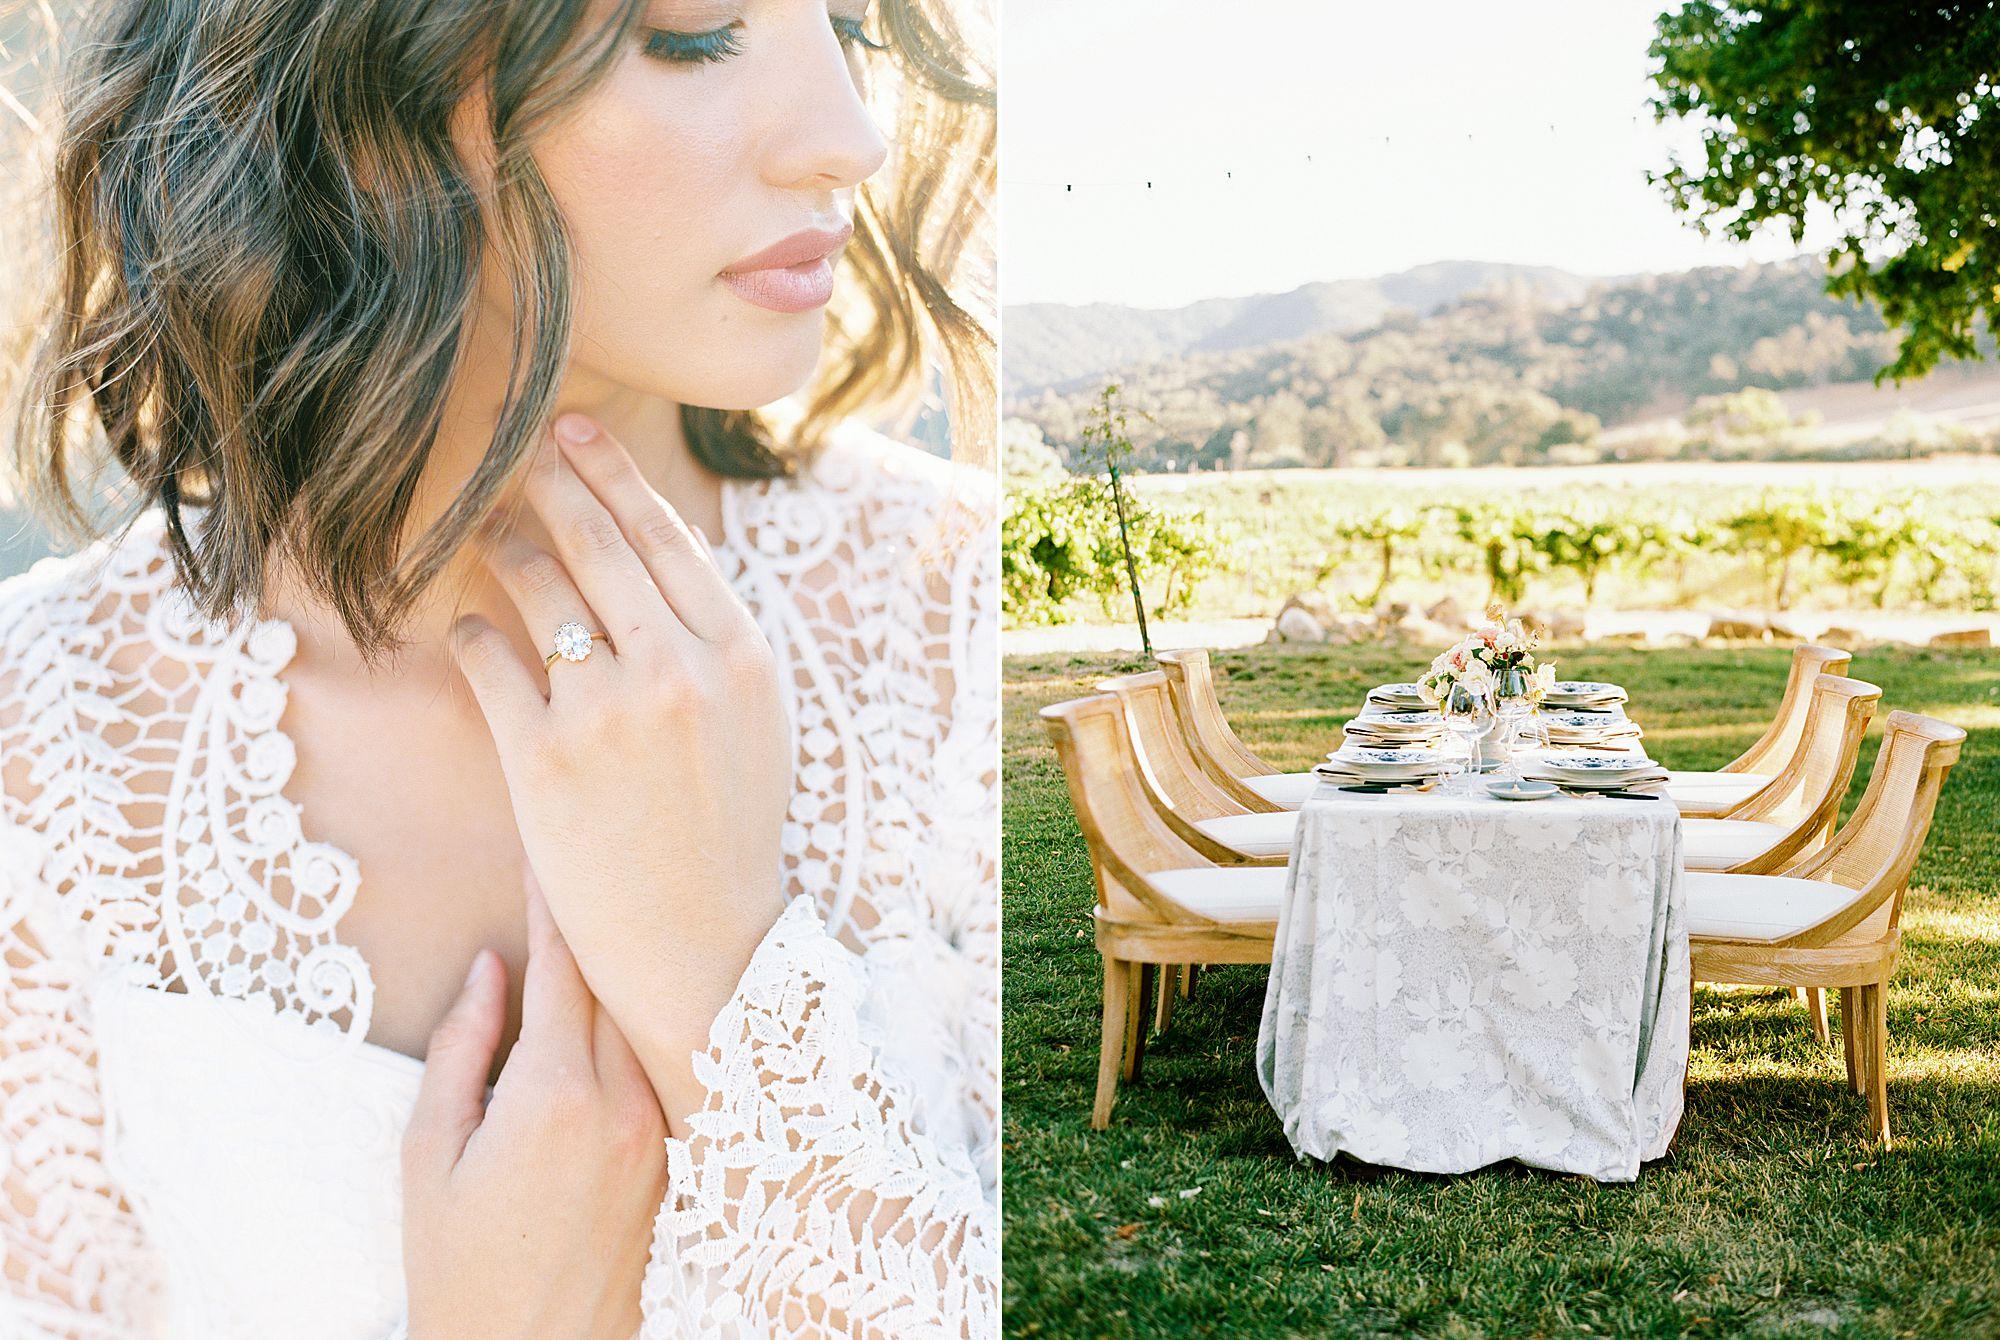 HammerSky Wedding Inspiration Featured on Hey Wedding Lady with Vanessa Noel Events - Ashley Baumgartner - SLO Wedding Photographer_0041.jpg